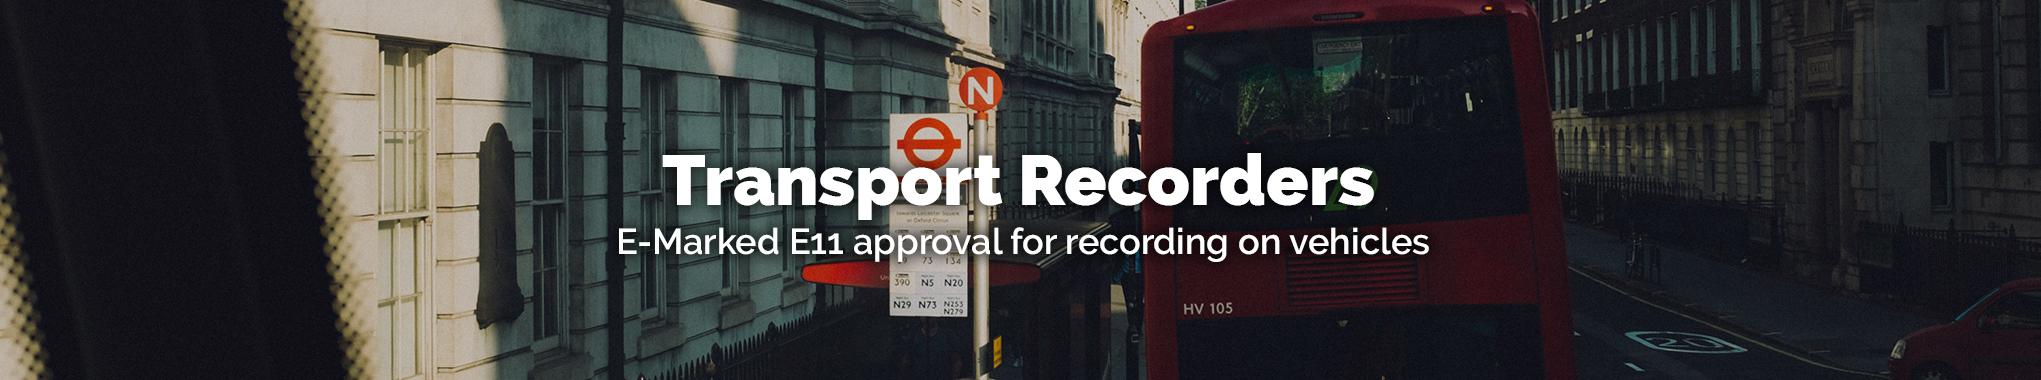 Transport Recorders